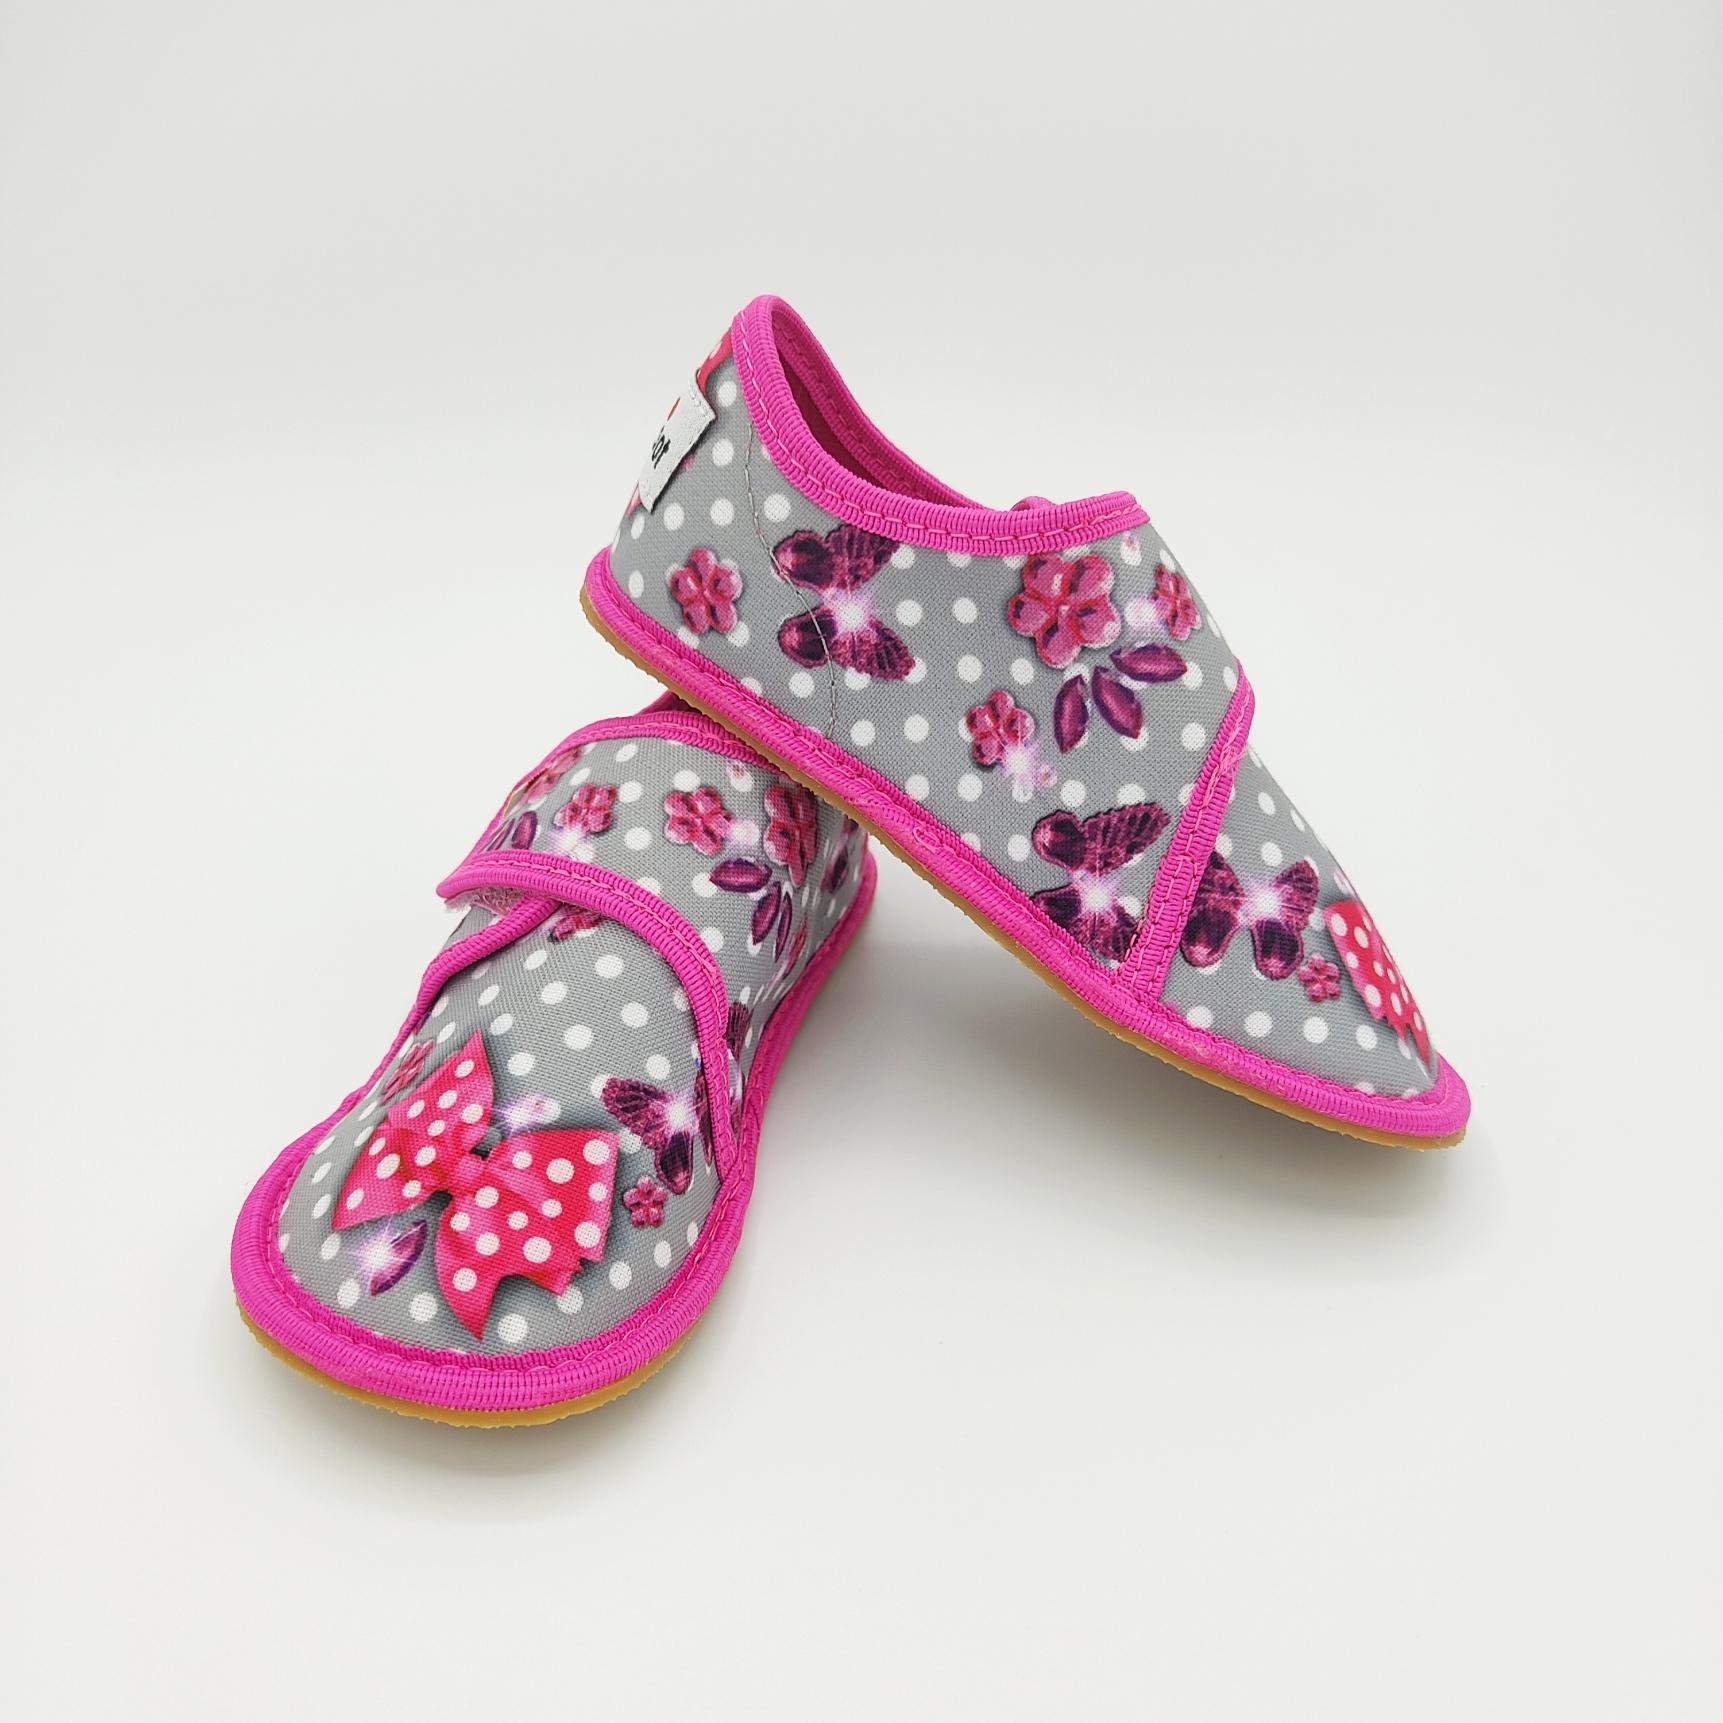 Chaussons EF barefoot en tissu - 394 Butterfly